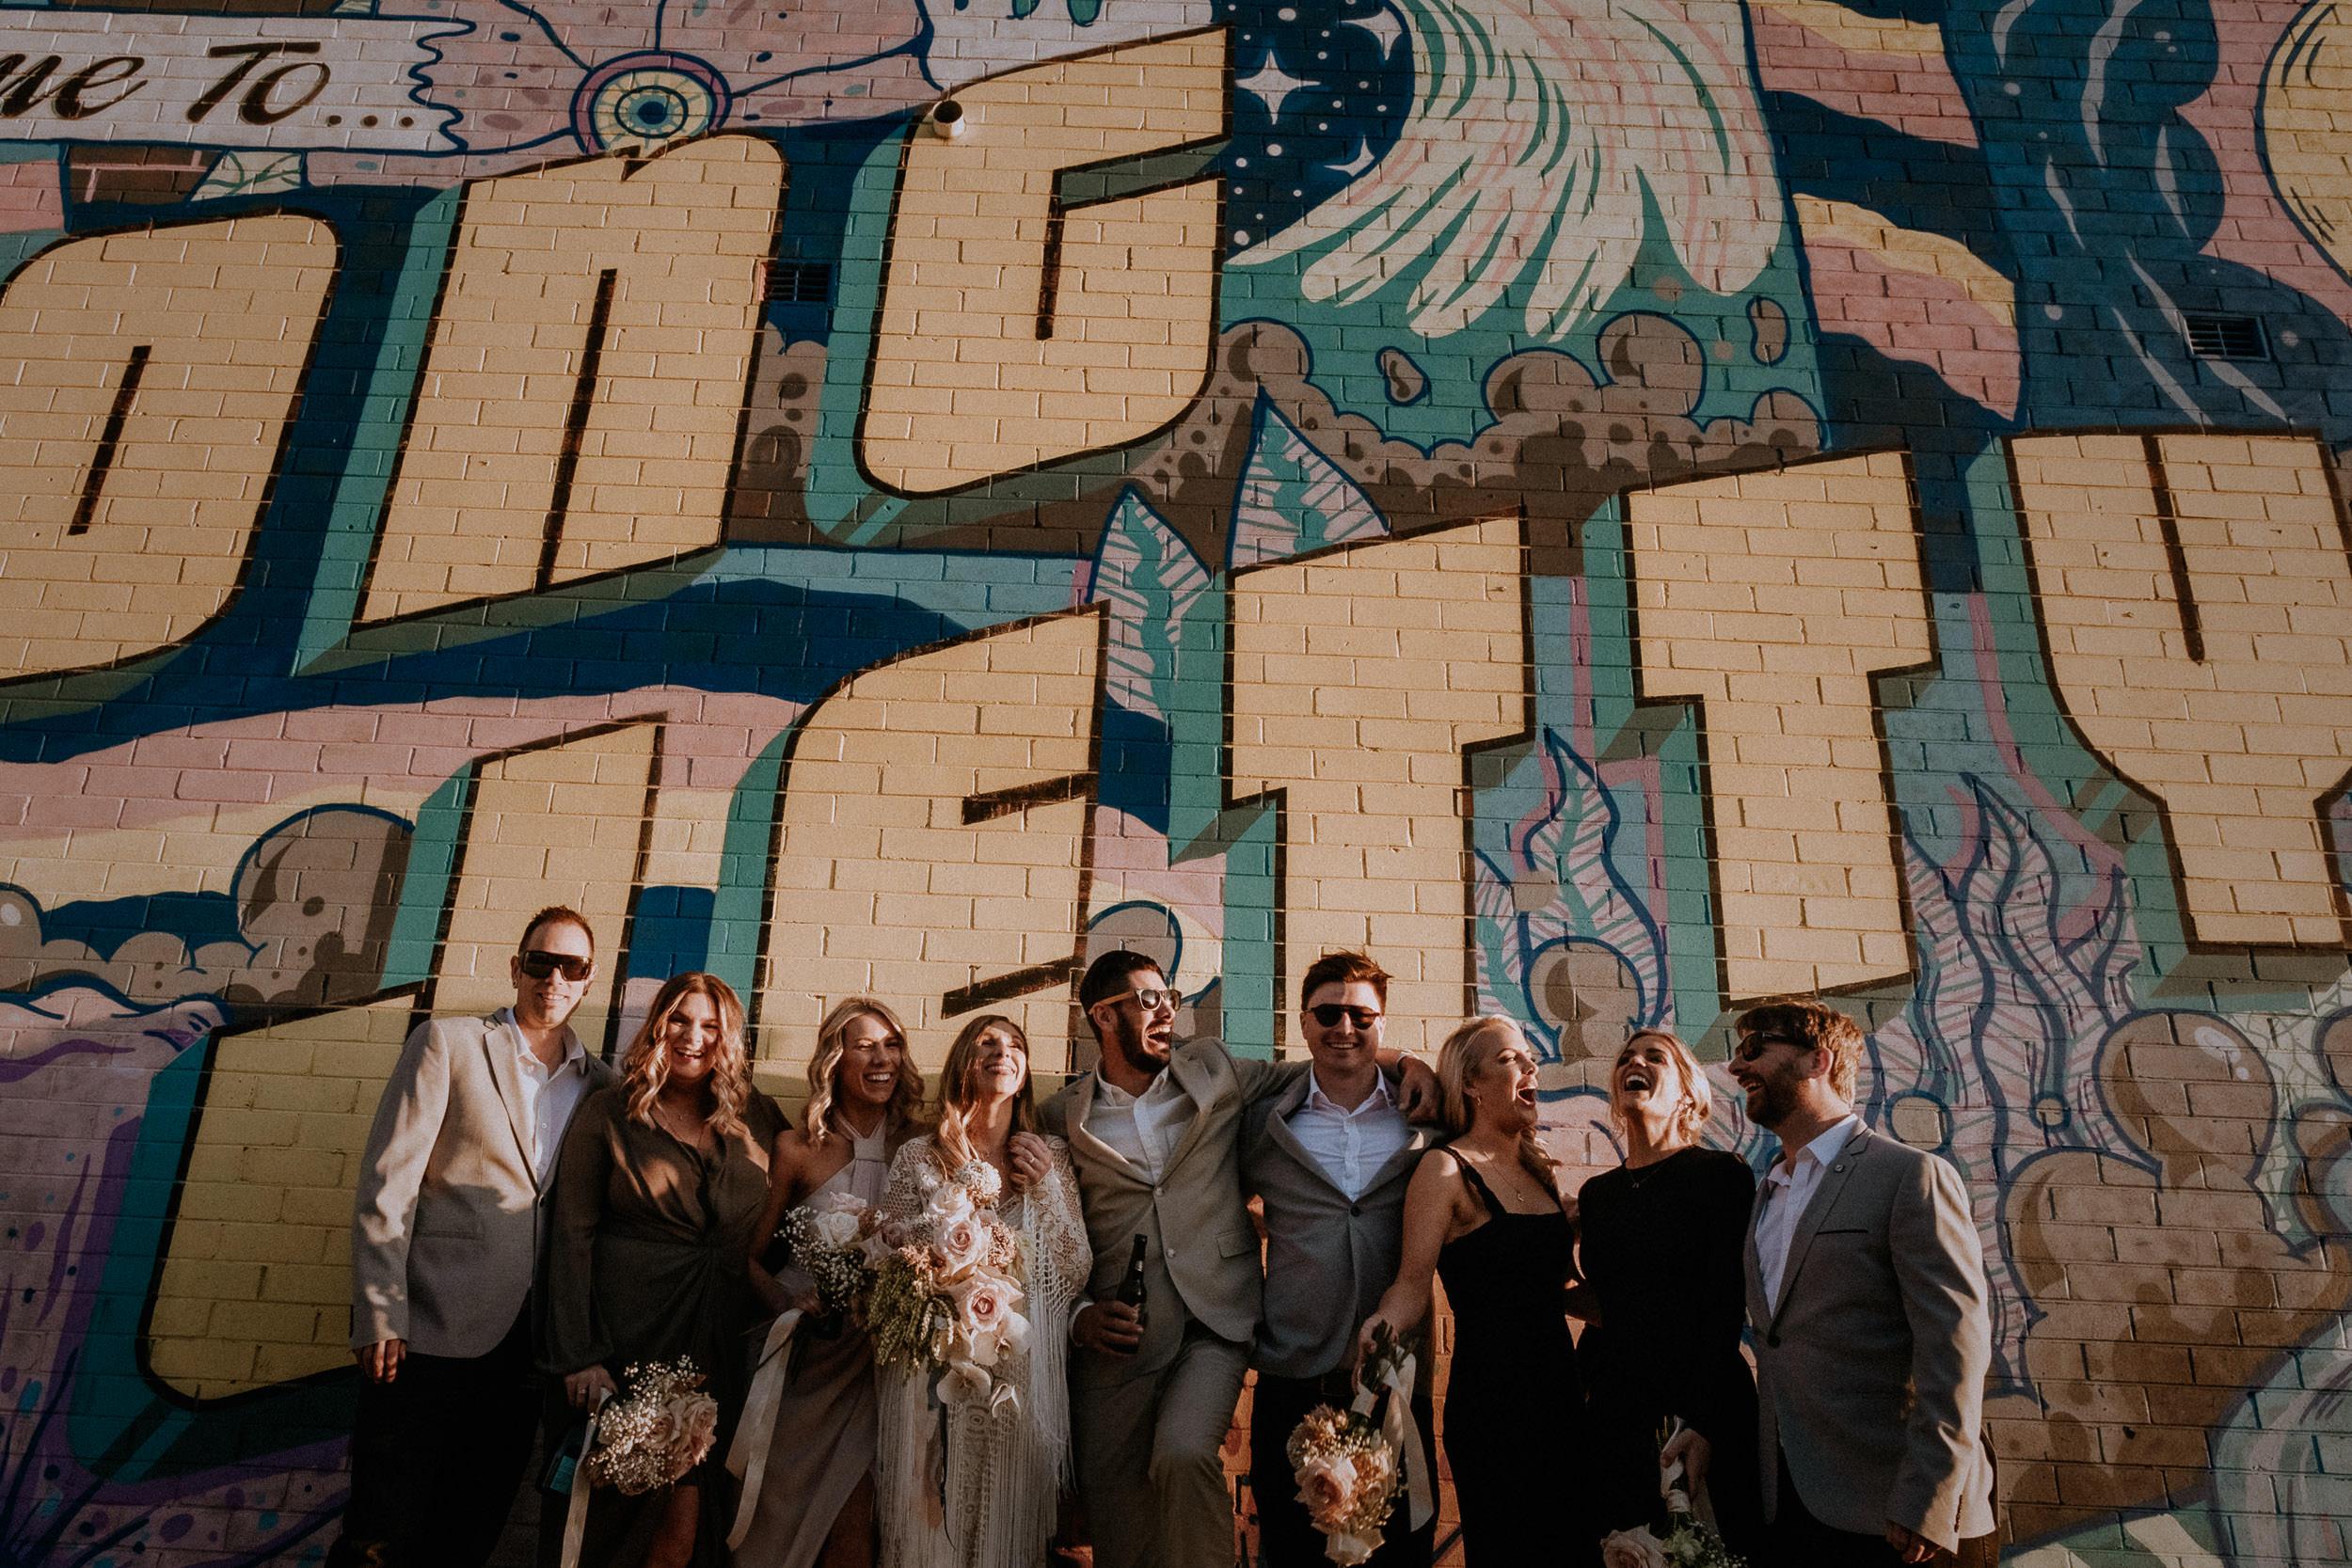 S&A Elopement - Kings & Thieves - Shred 'Til Dead - Central Coast Beach Forest Wedding - 348.jpg